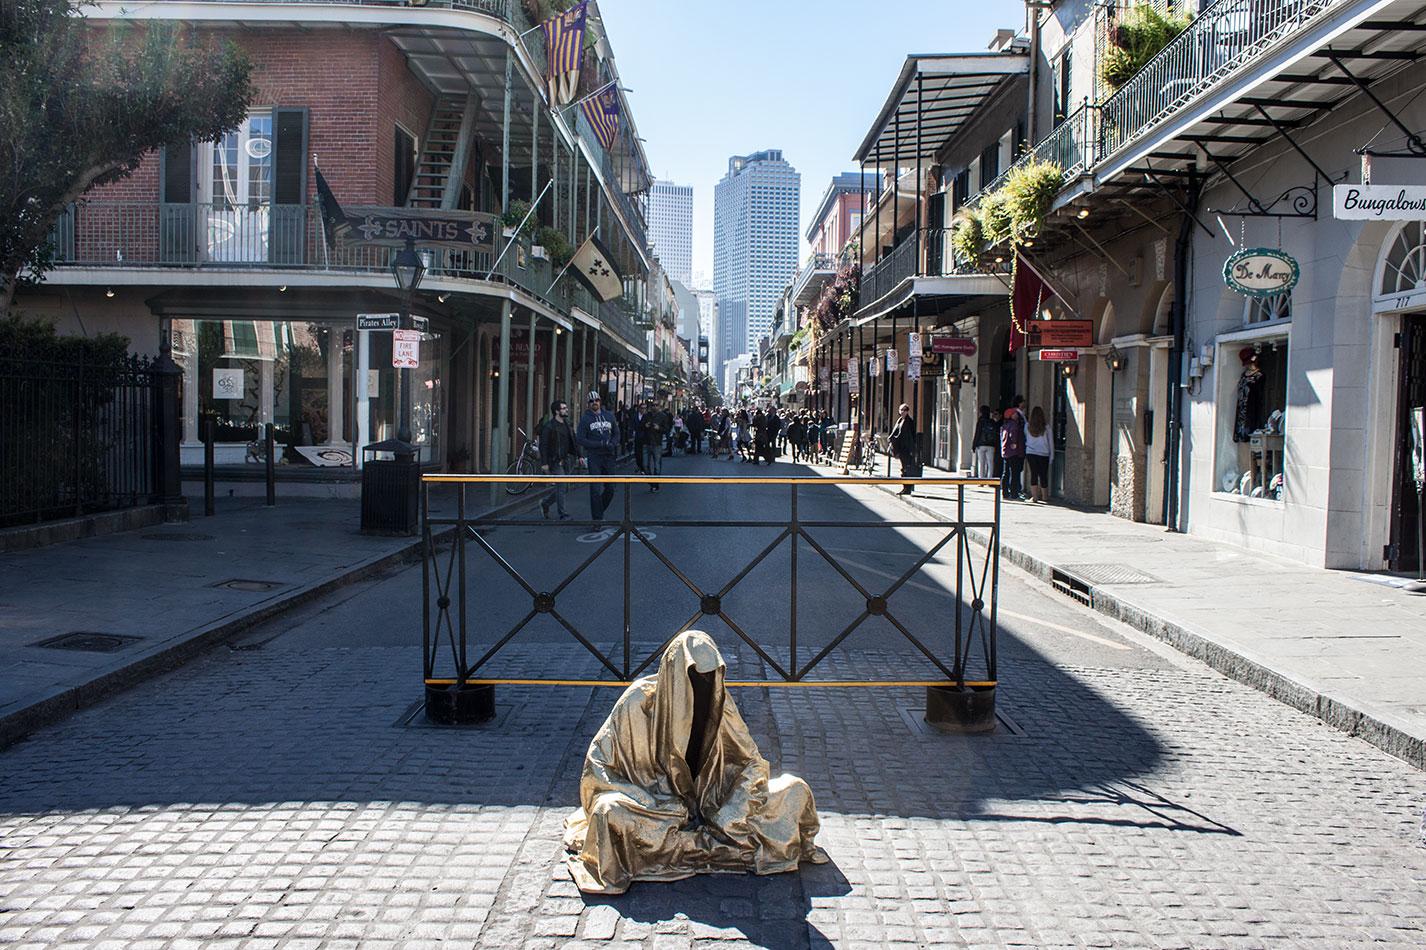 public-art-show-New-Orleans-Louisiana-usa-guardians-of-time-manfred-kili-kielnhofer-contemporary-fine-art-modern-arts-design-antiques-sculpture-5439